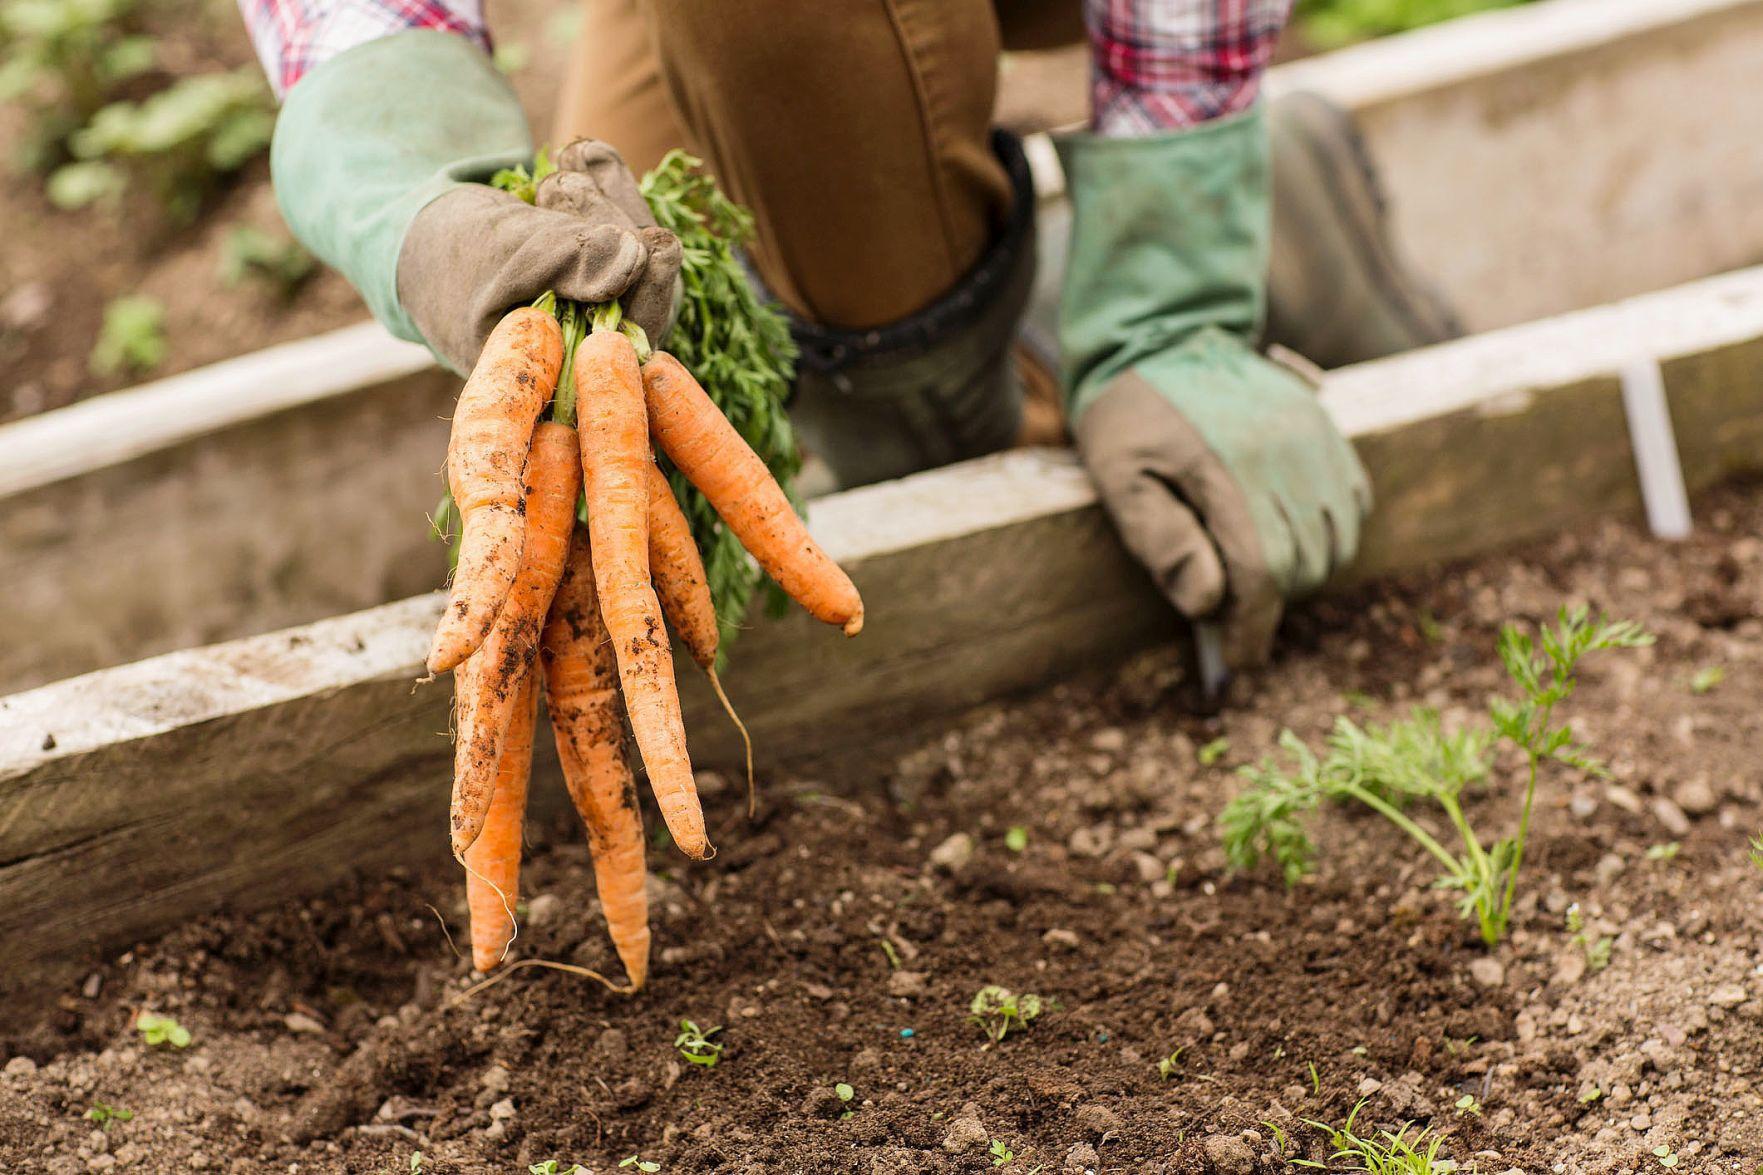 Community gardens benefit from grants Local News newspressnowcom